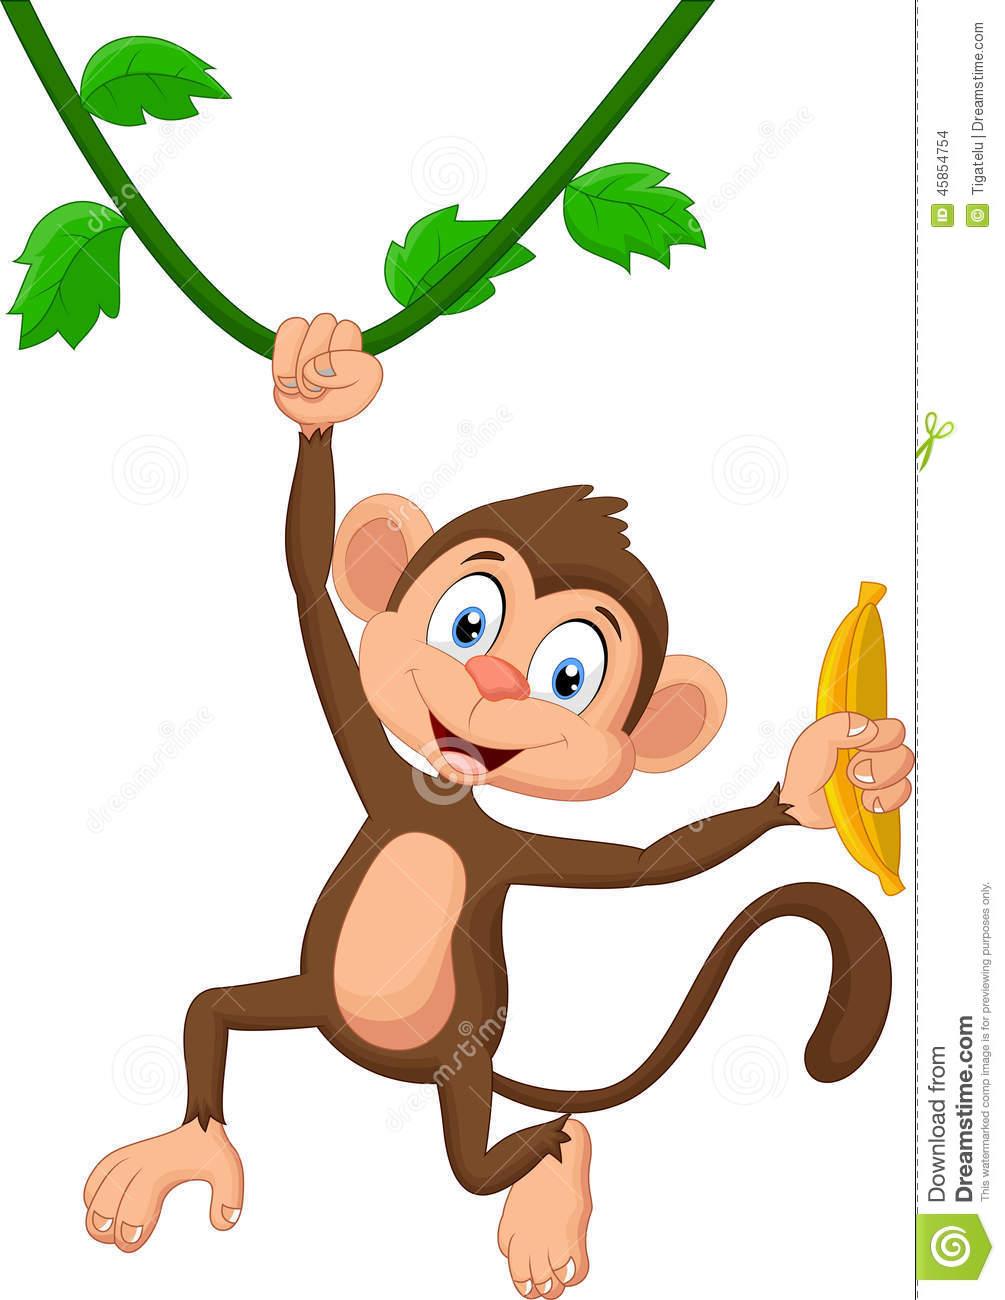 Cute Cartoon Monkey Hanging From A Tree, Swinging Tree Clip.